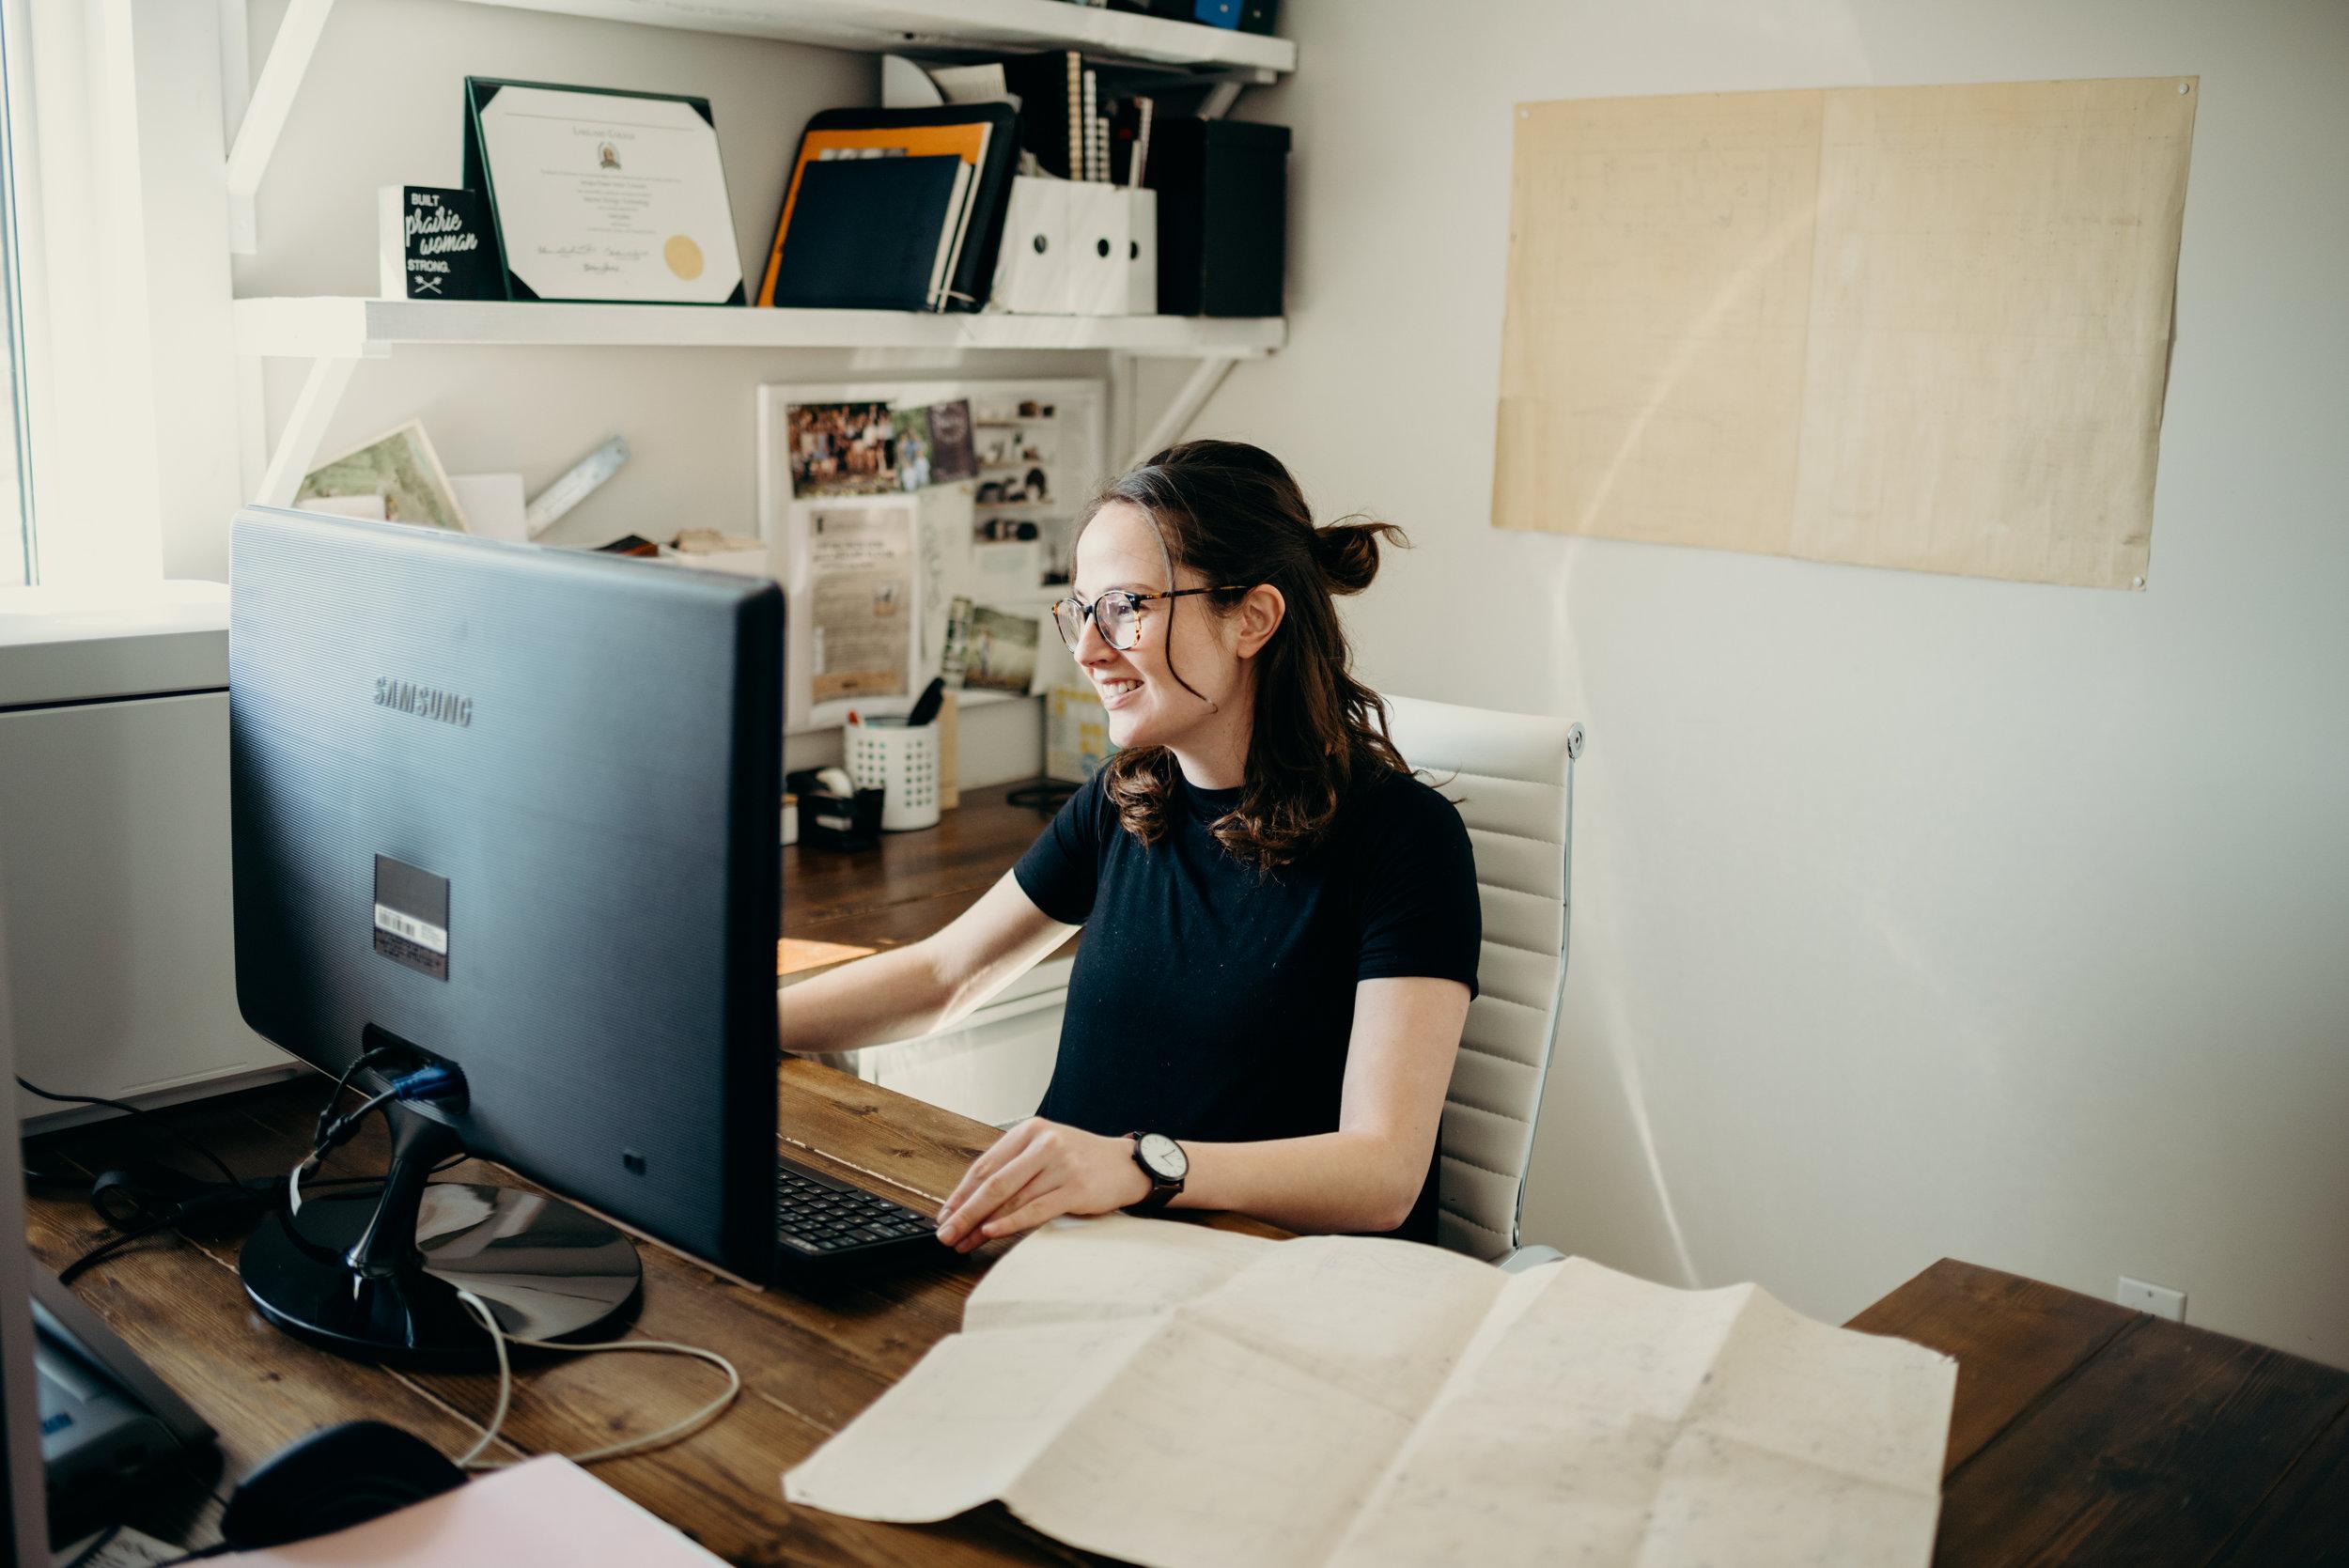 Jenaya Crosson - Owner & founder of JC Design